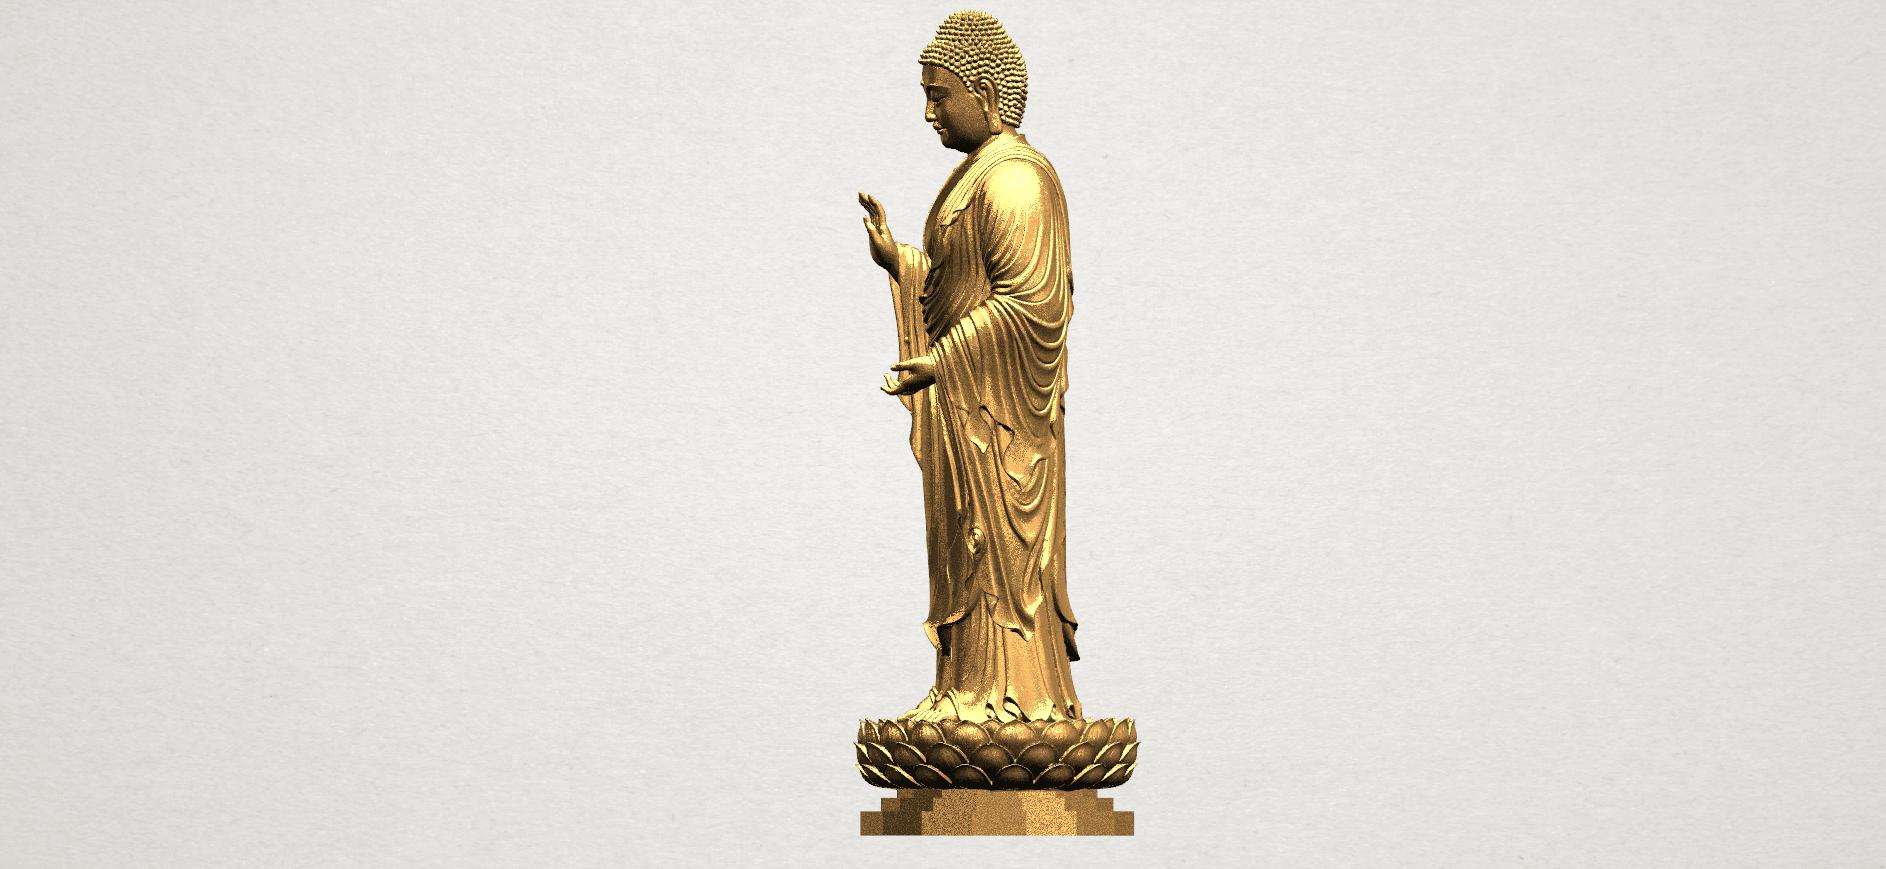 Gautama Buddha Standing (ii) A03.png Download free STL file Gautama Buddha Standing 02 • 3D printer design, GeorgesNikkei